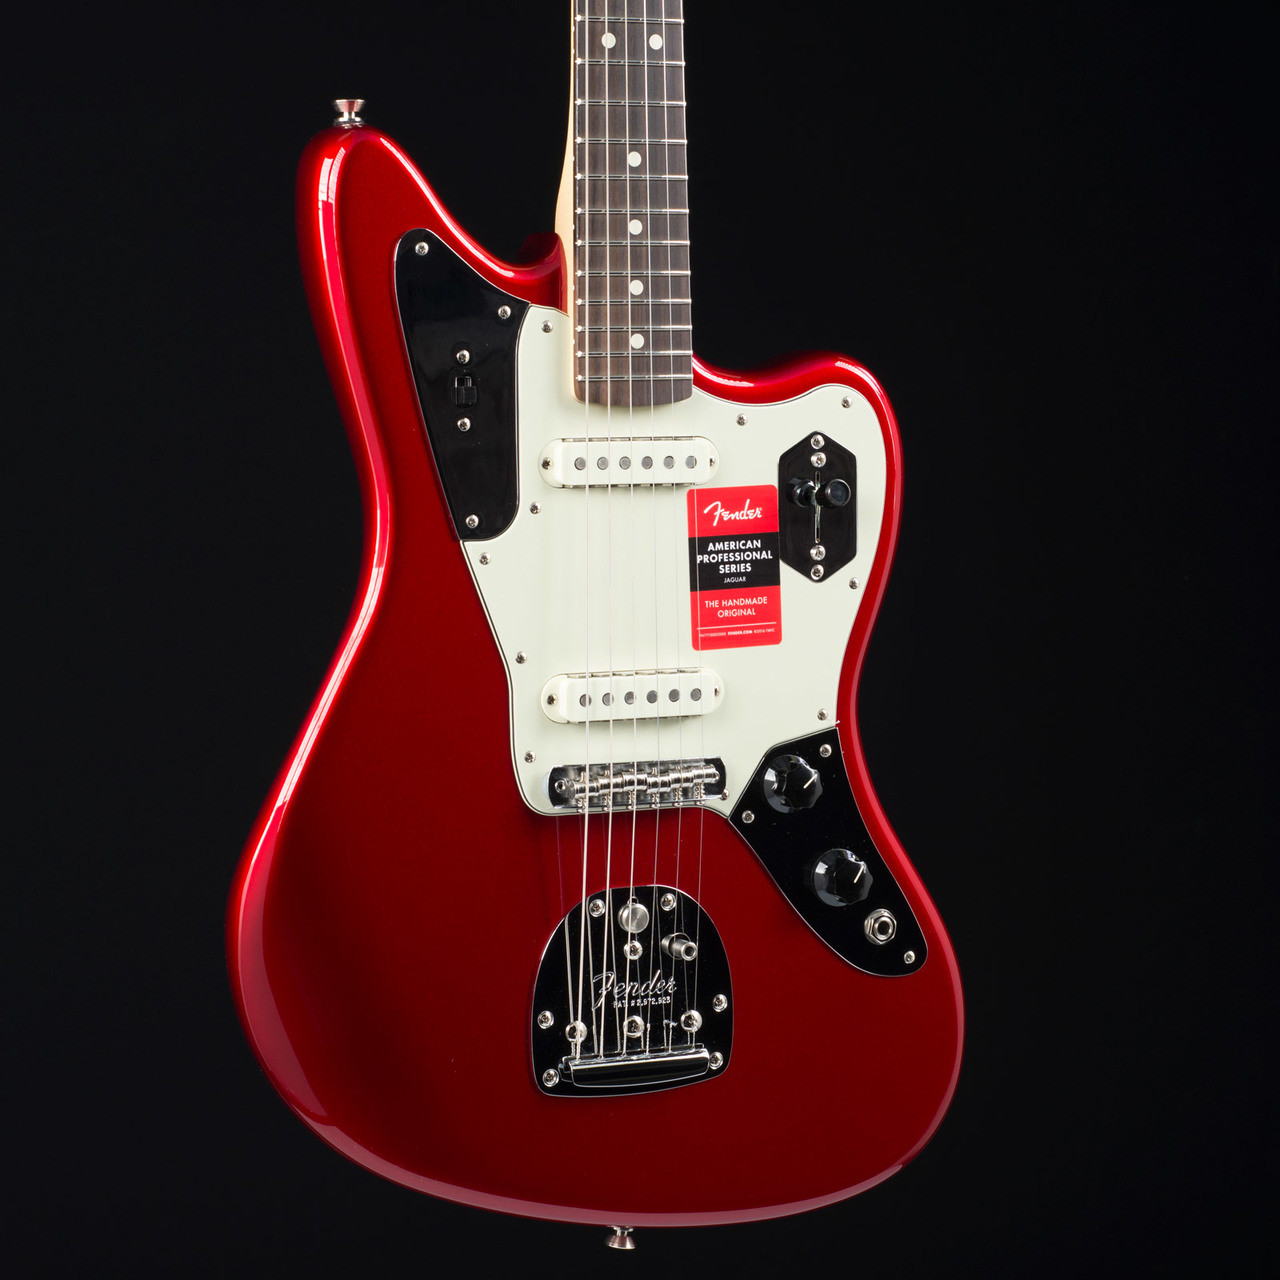 Fender Jaguar B Wiring Diagram Schematics Kit Schematic Diagrams Amp